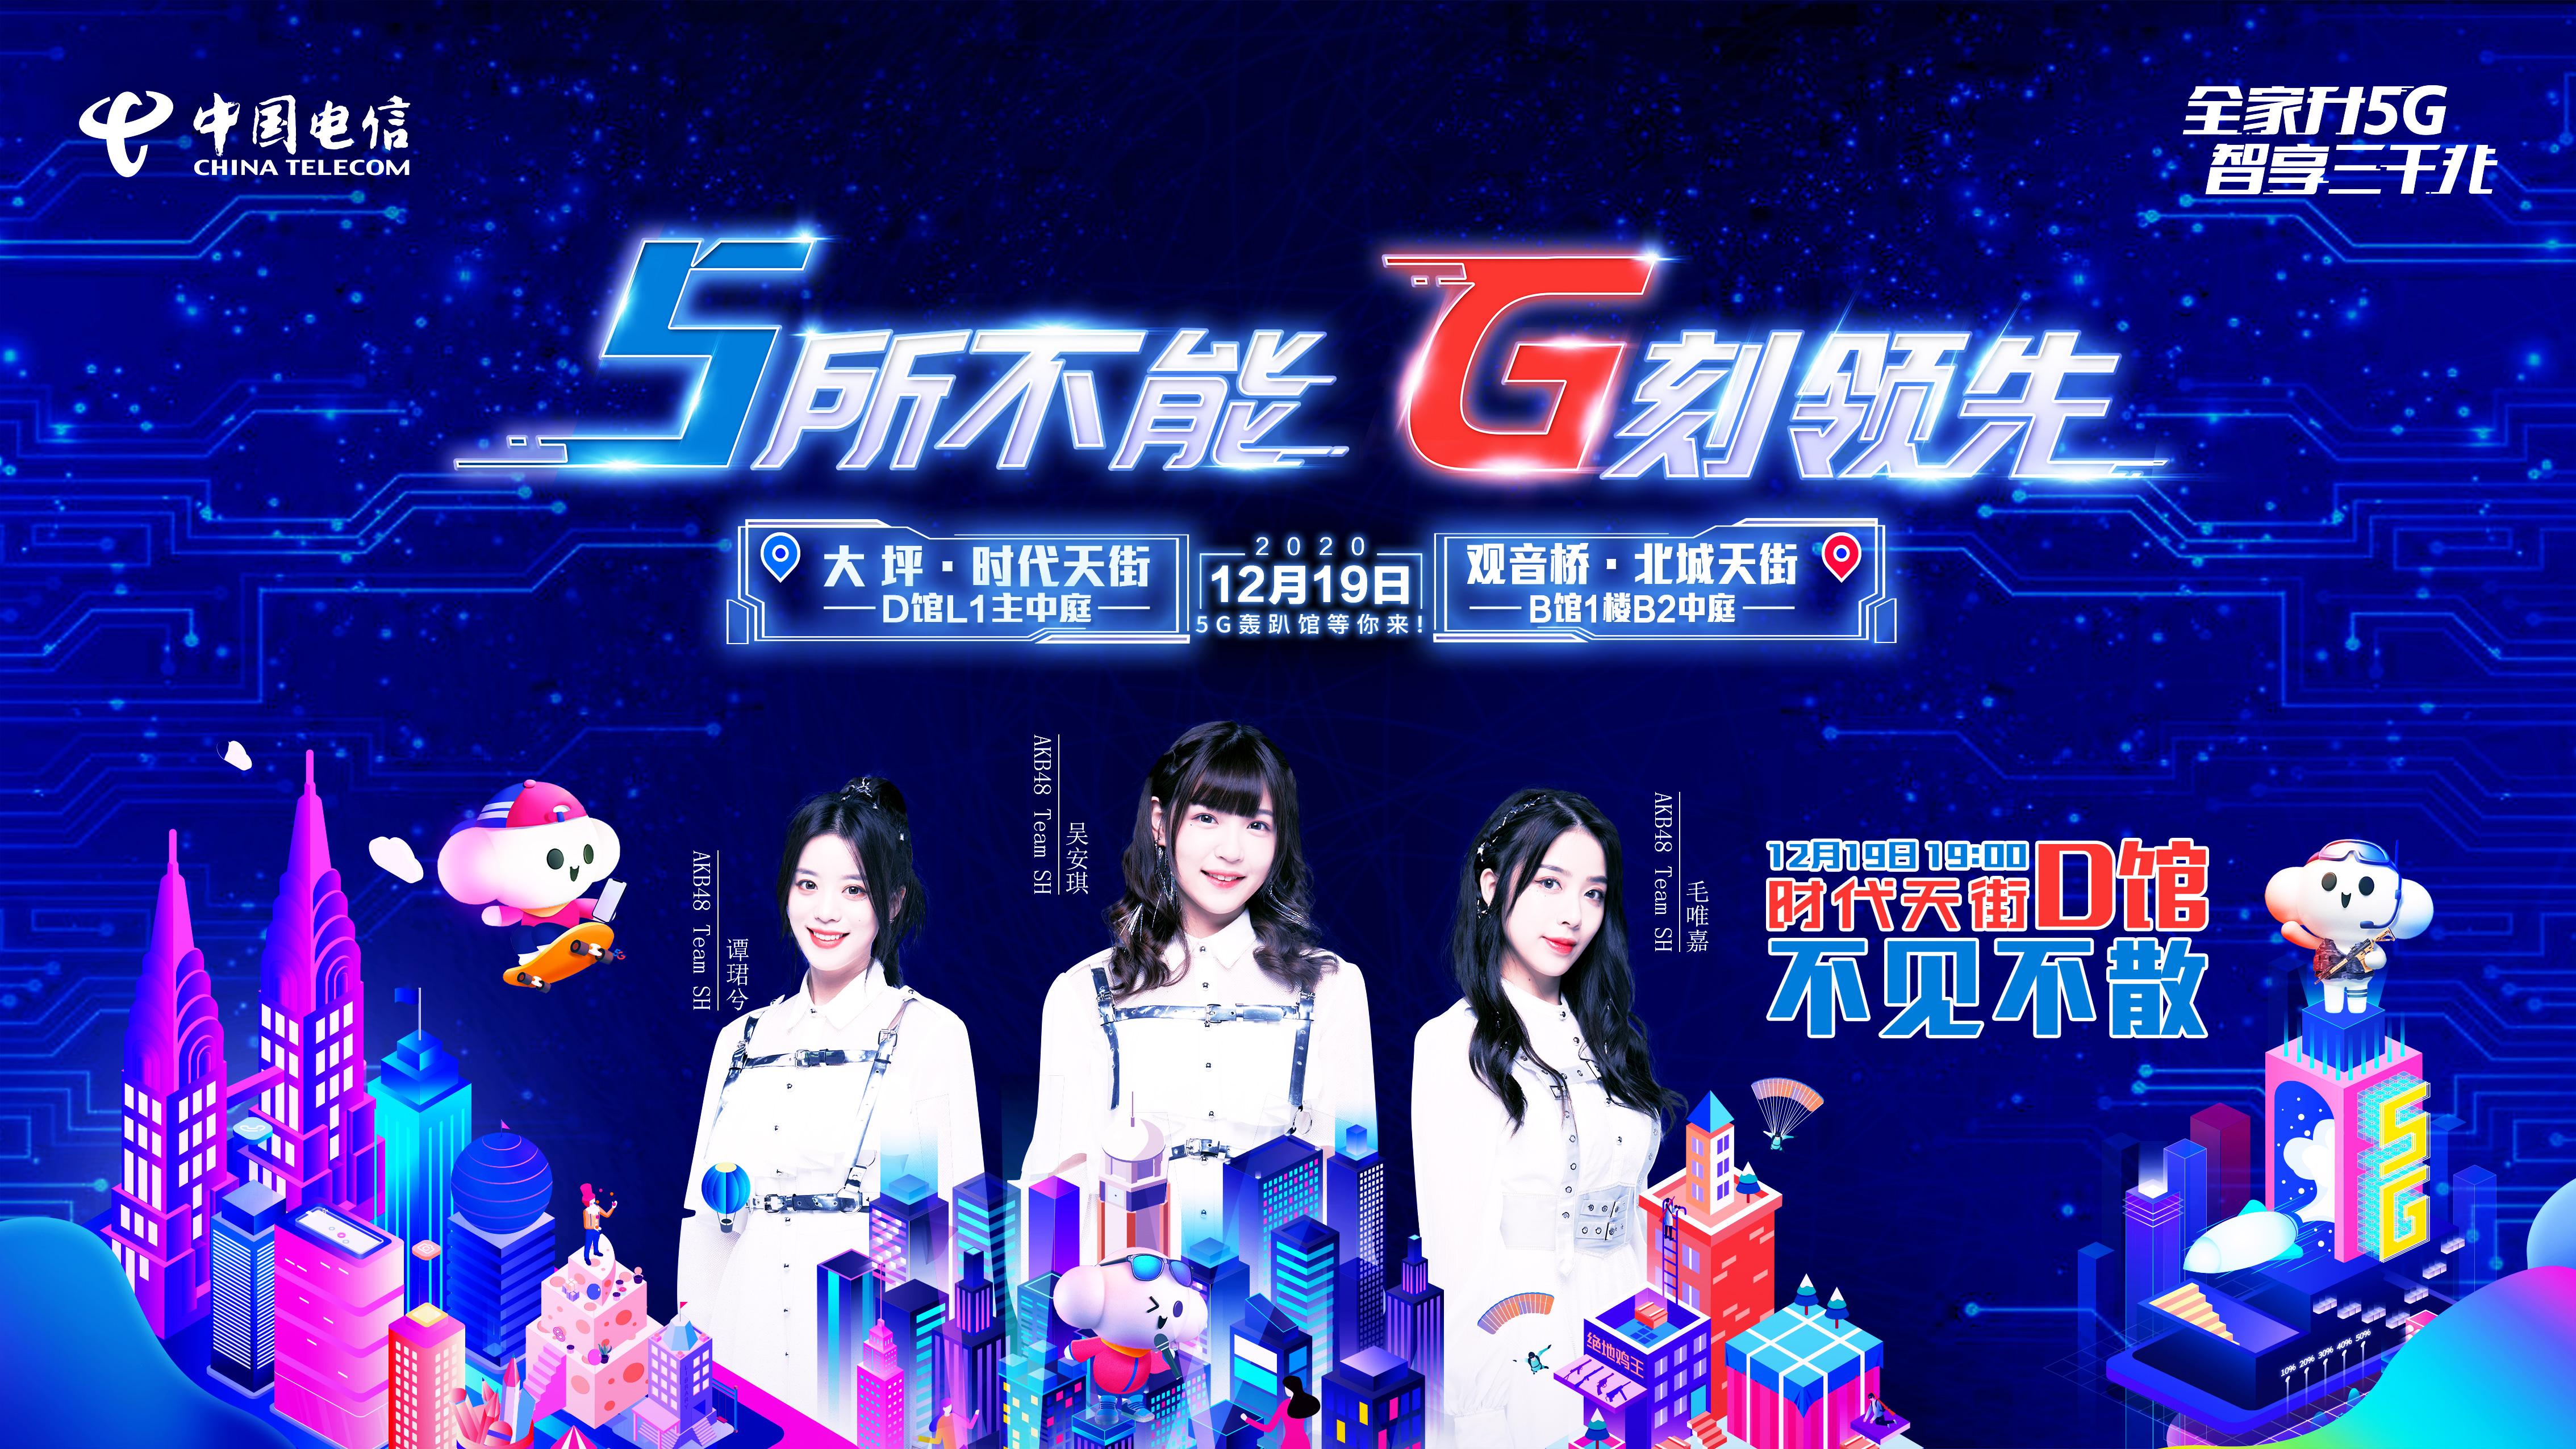 AKB48 Team SH燃情演出,嗨翻中国电信5G轰趴馆